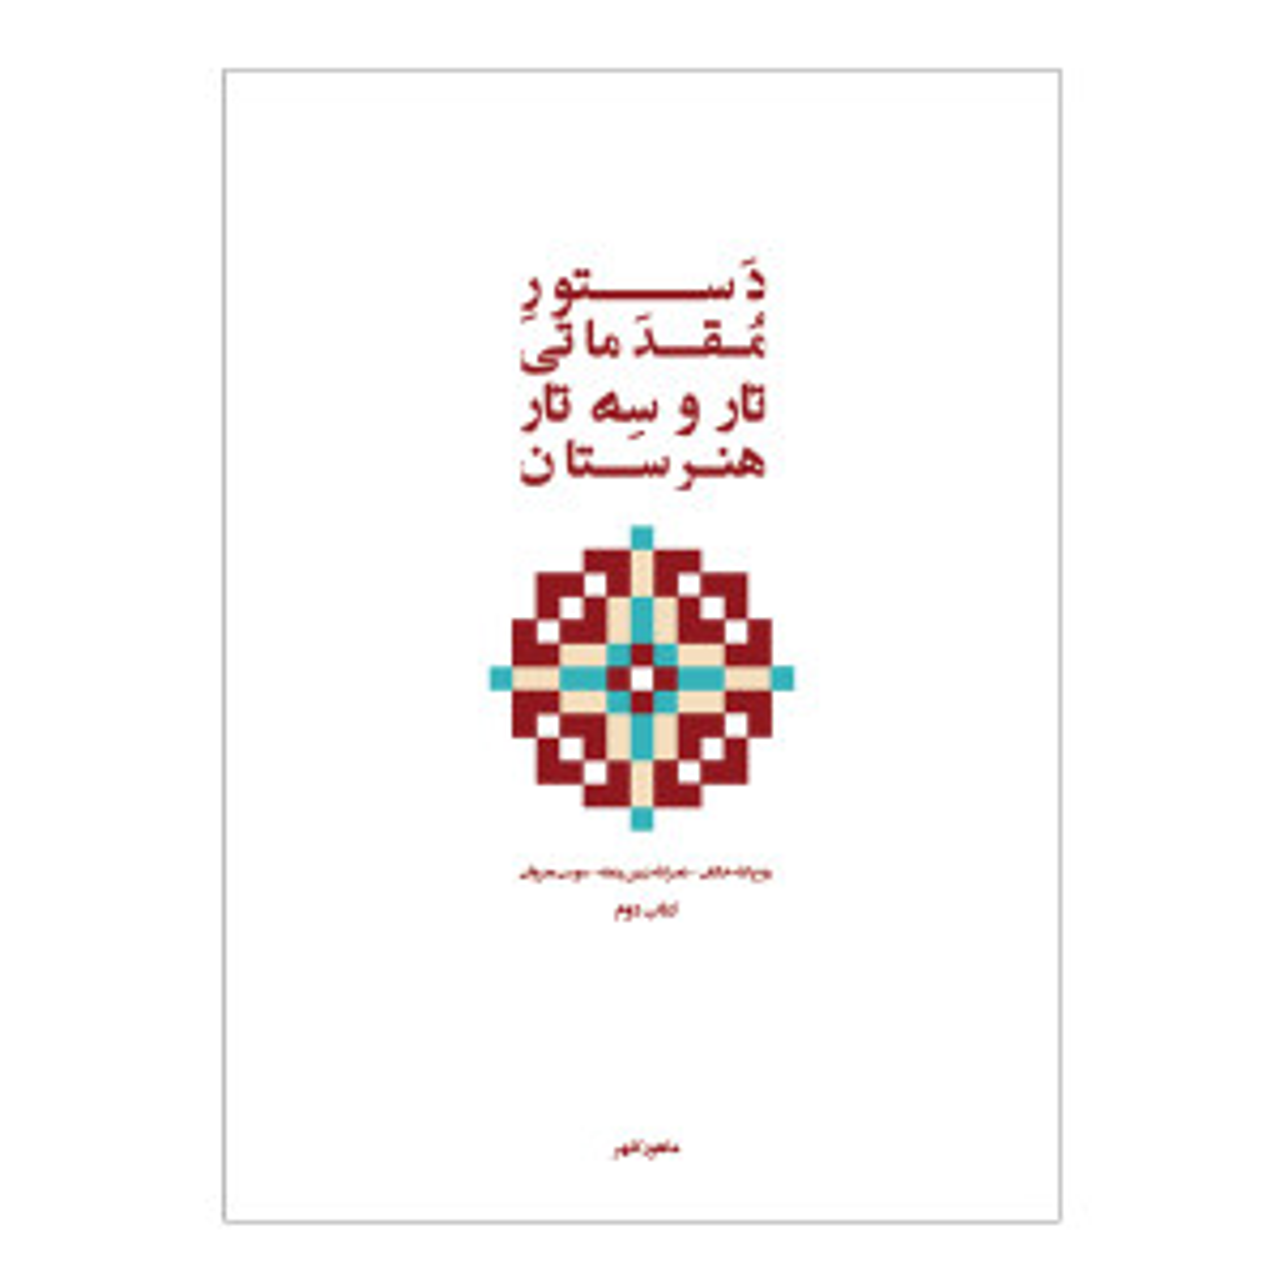 کتاب دستور مقدماتی تار و سه تار هنرستان موسیقی اثر روح الله خالقی انتشارات پنج خط جلد 2